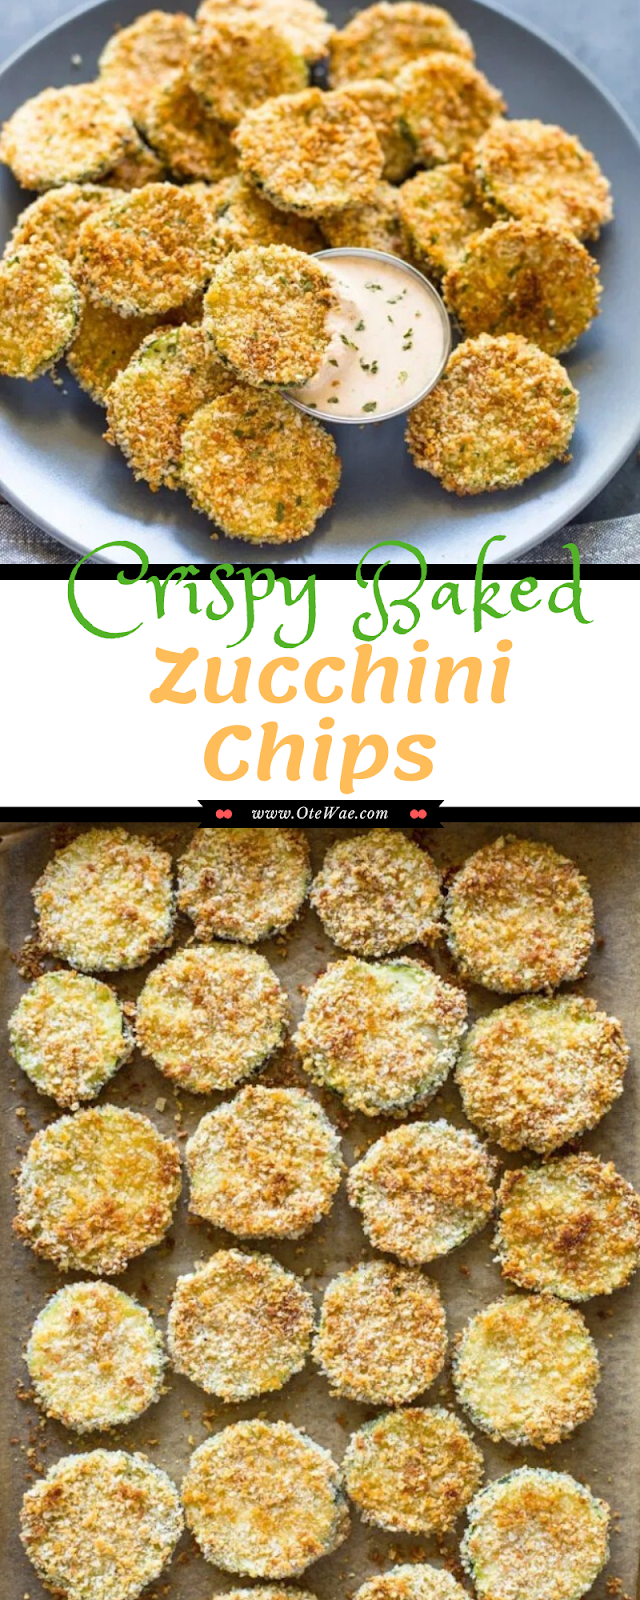 Crispy Baked Zucchini Chips